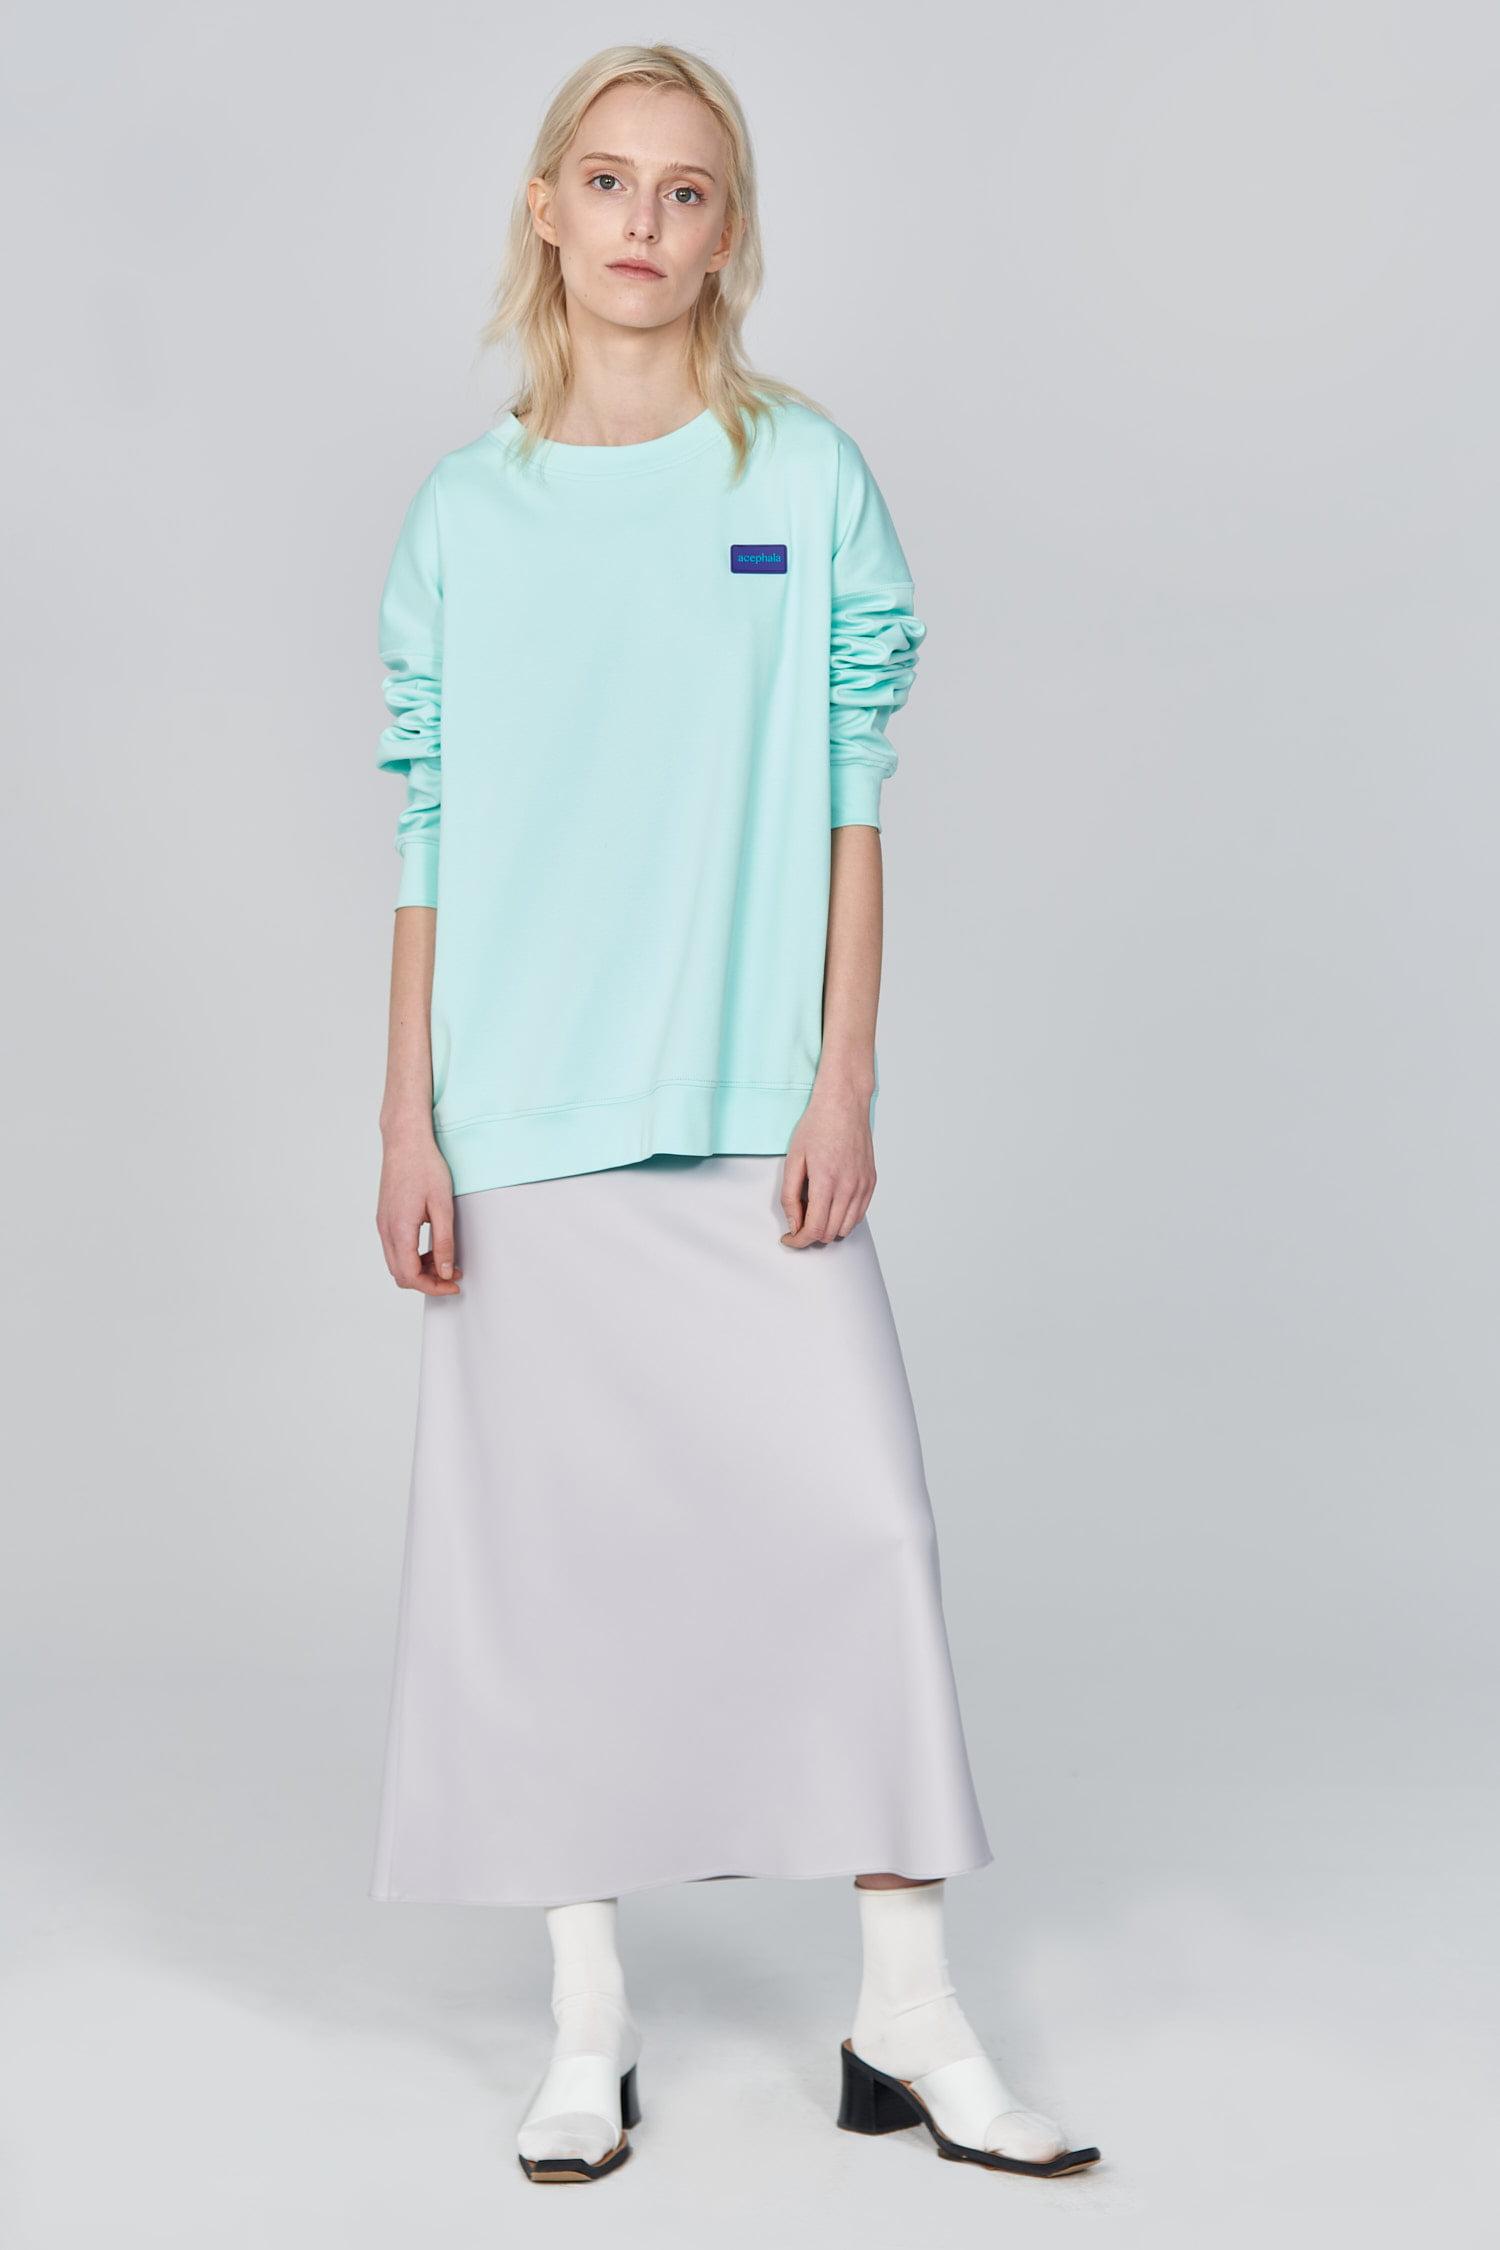 Acephala Ss21 Unisex Mint Sweatshirt Front Relaxed